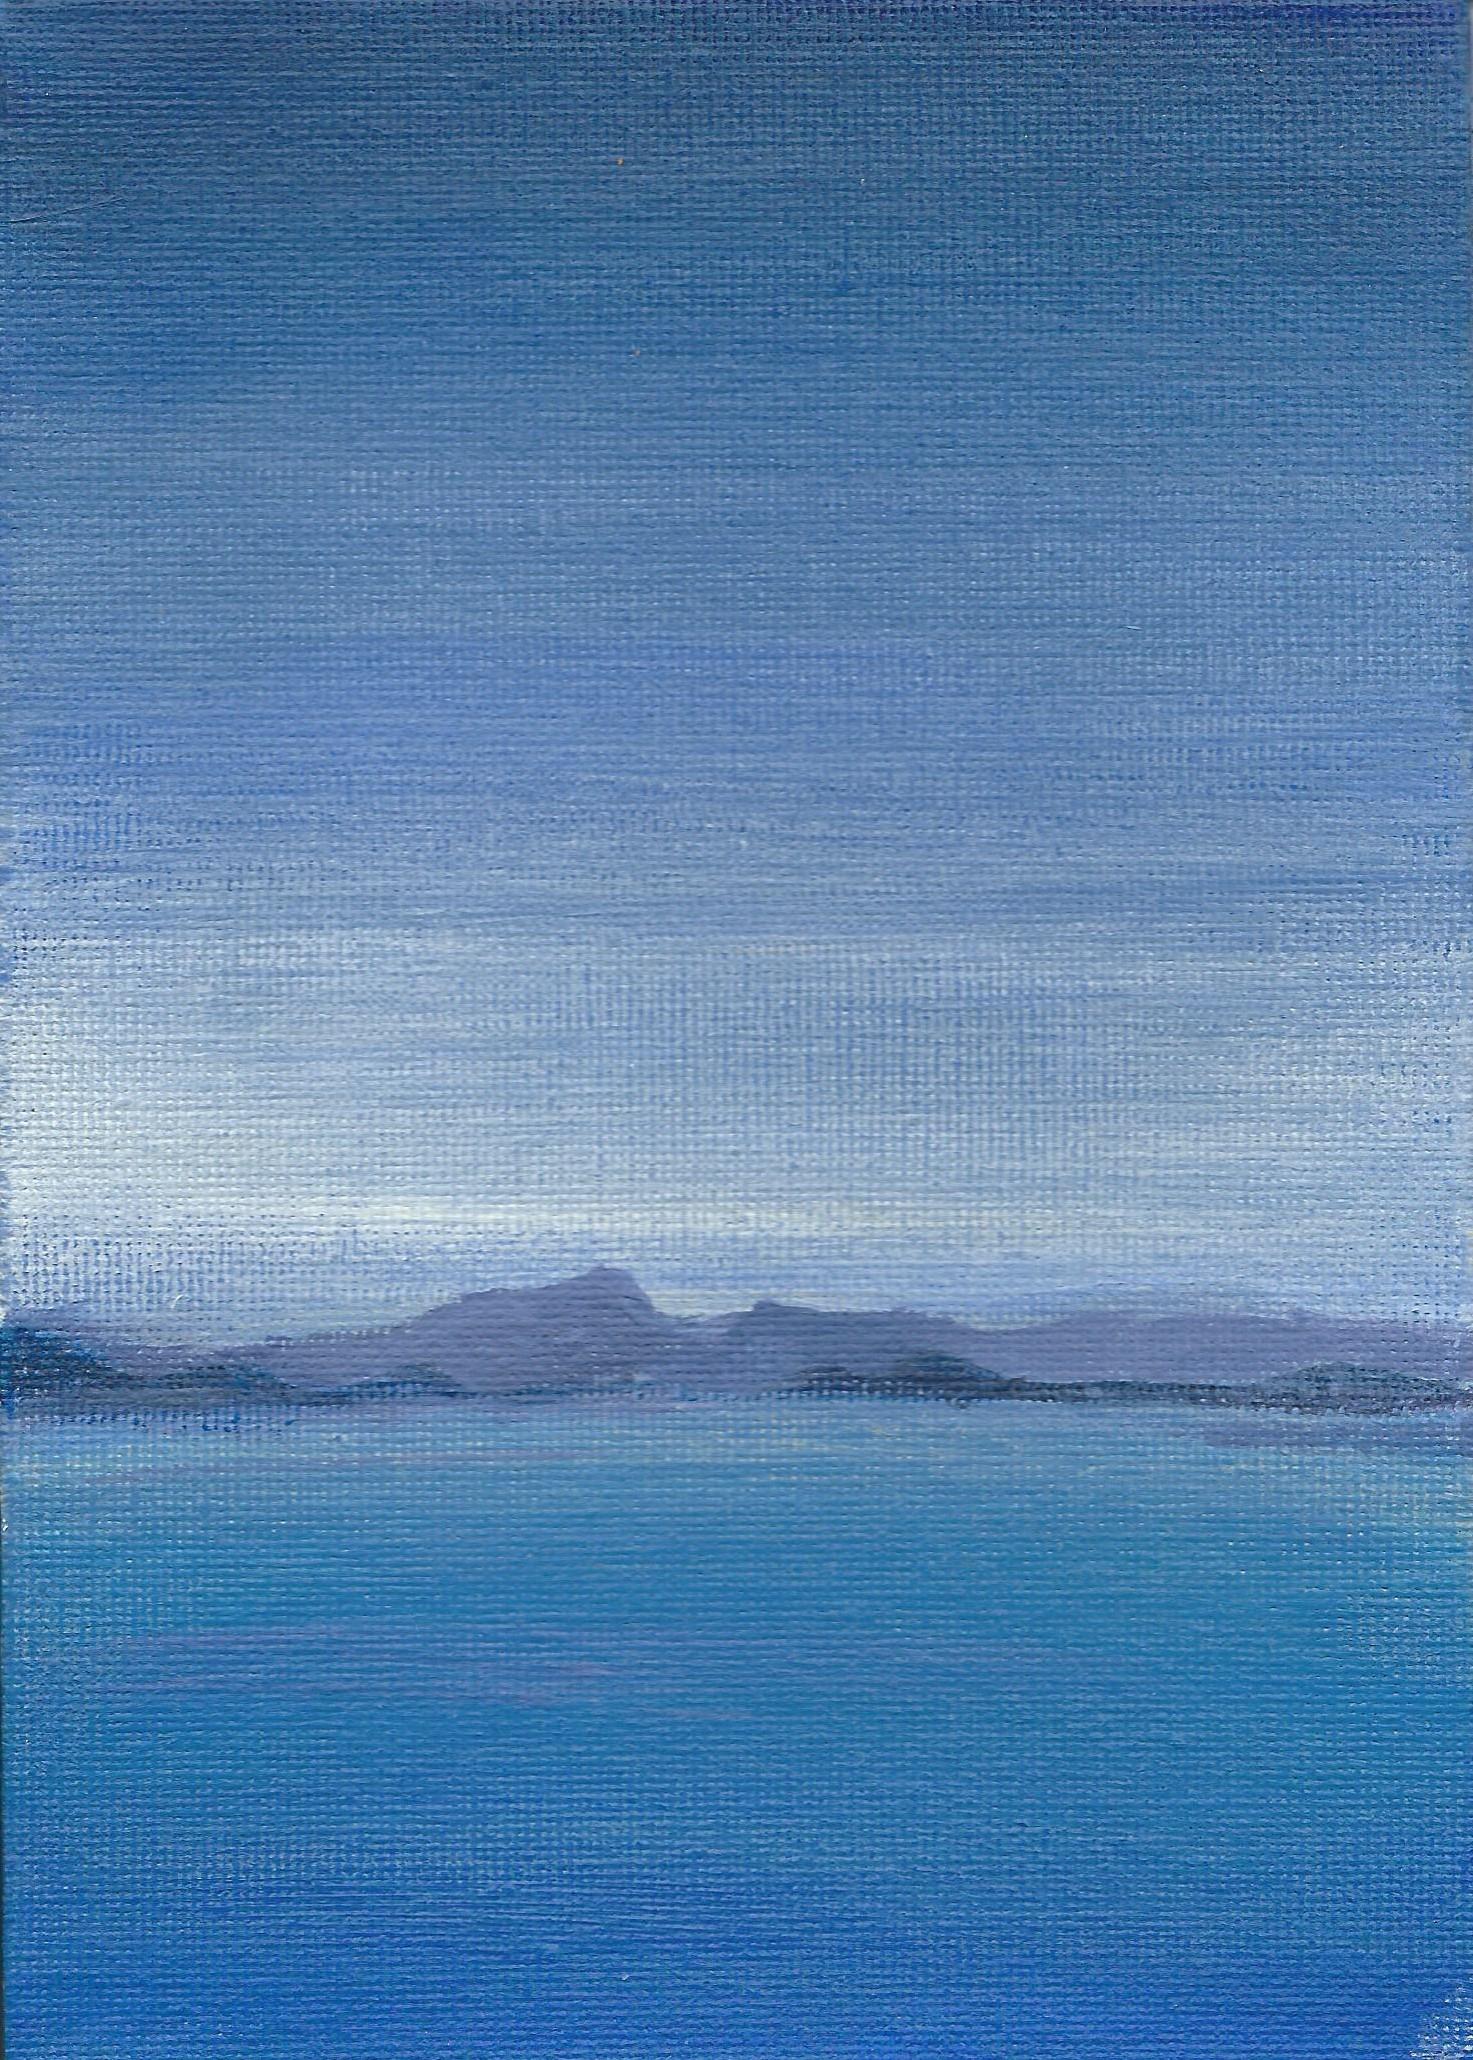 Firth of Lorne